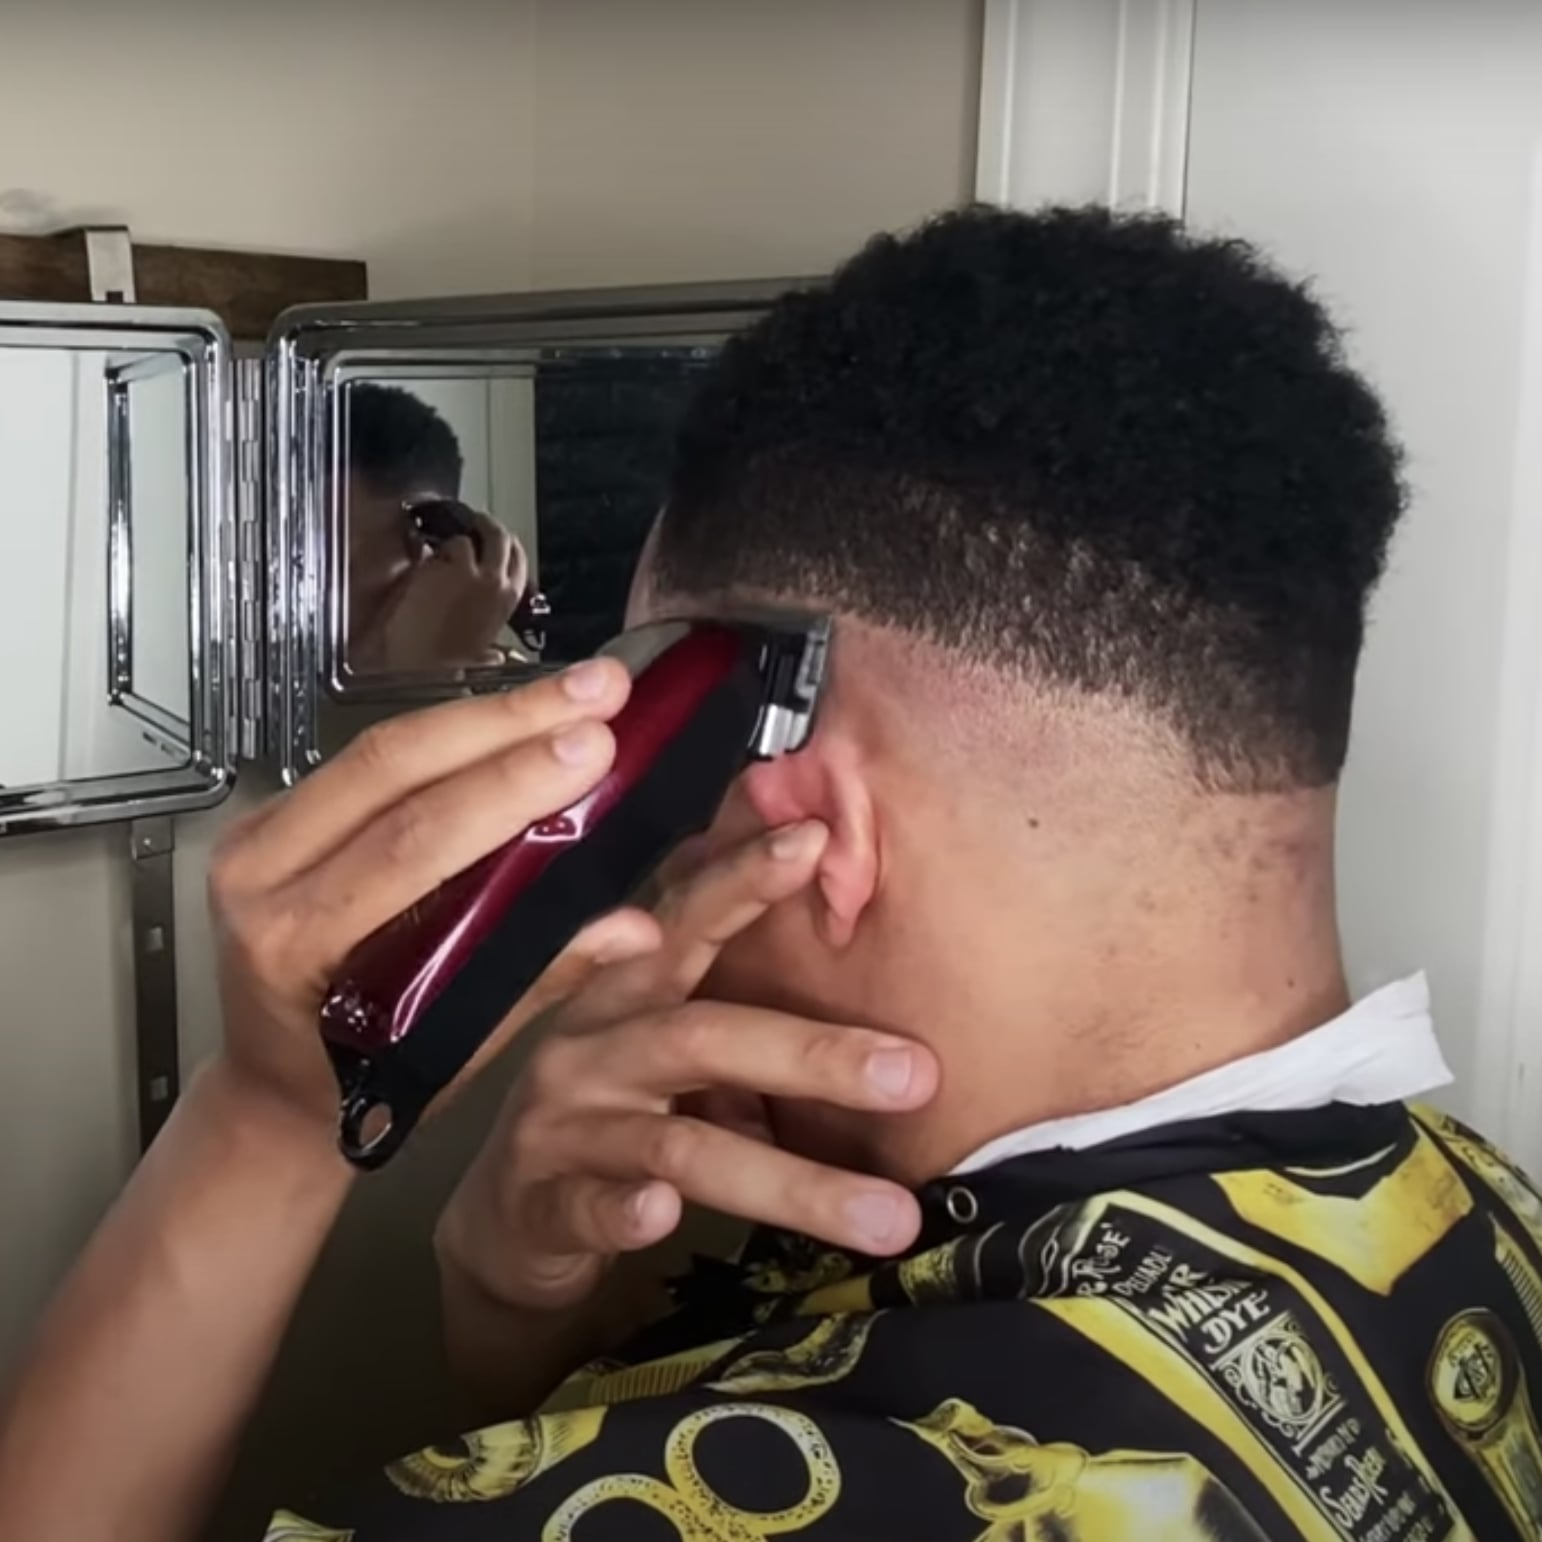 A Barber S Tips On Doing A Men S Fade Haircut Popsugar Beauty Australia